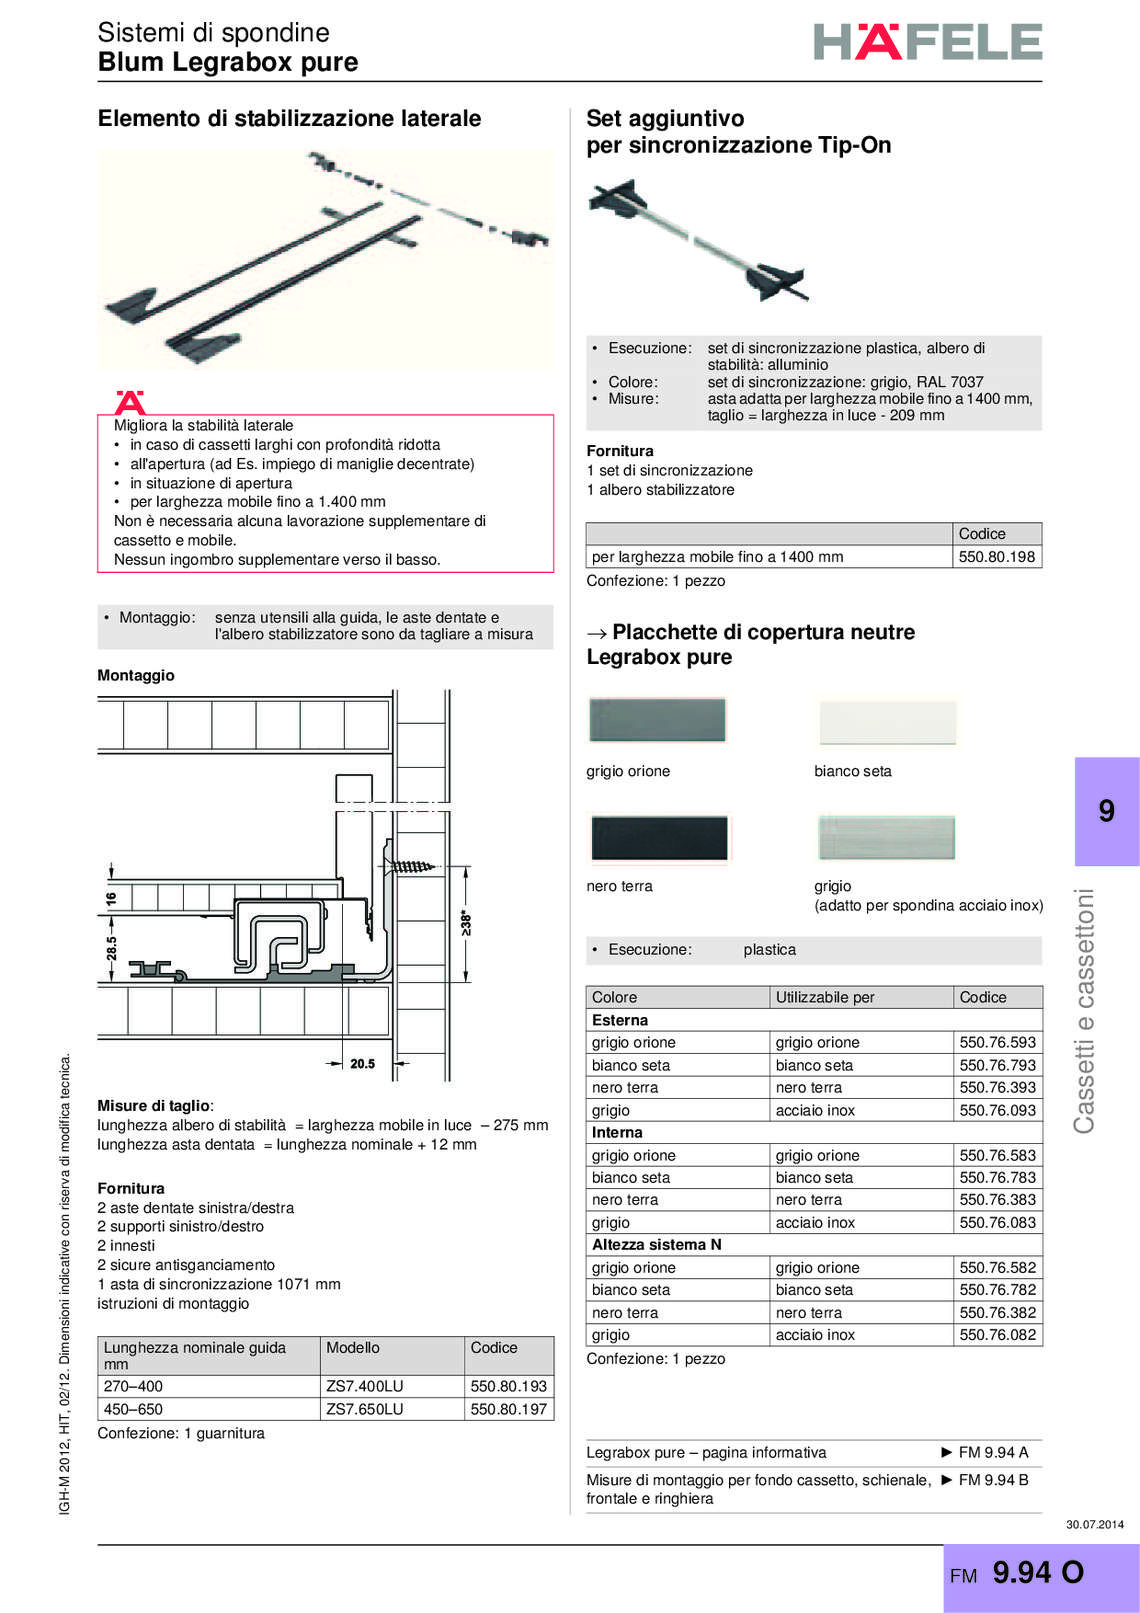 hafele-spondine-e-guide-per-mobili_40_132.jpg